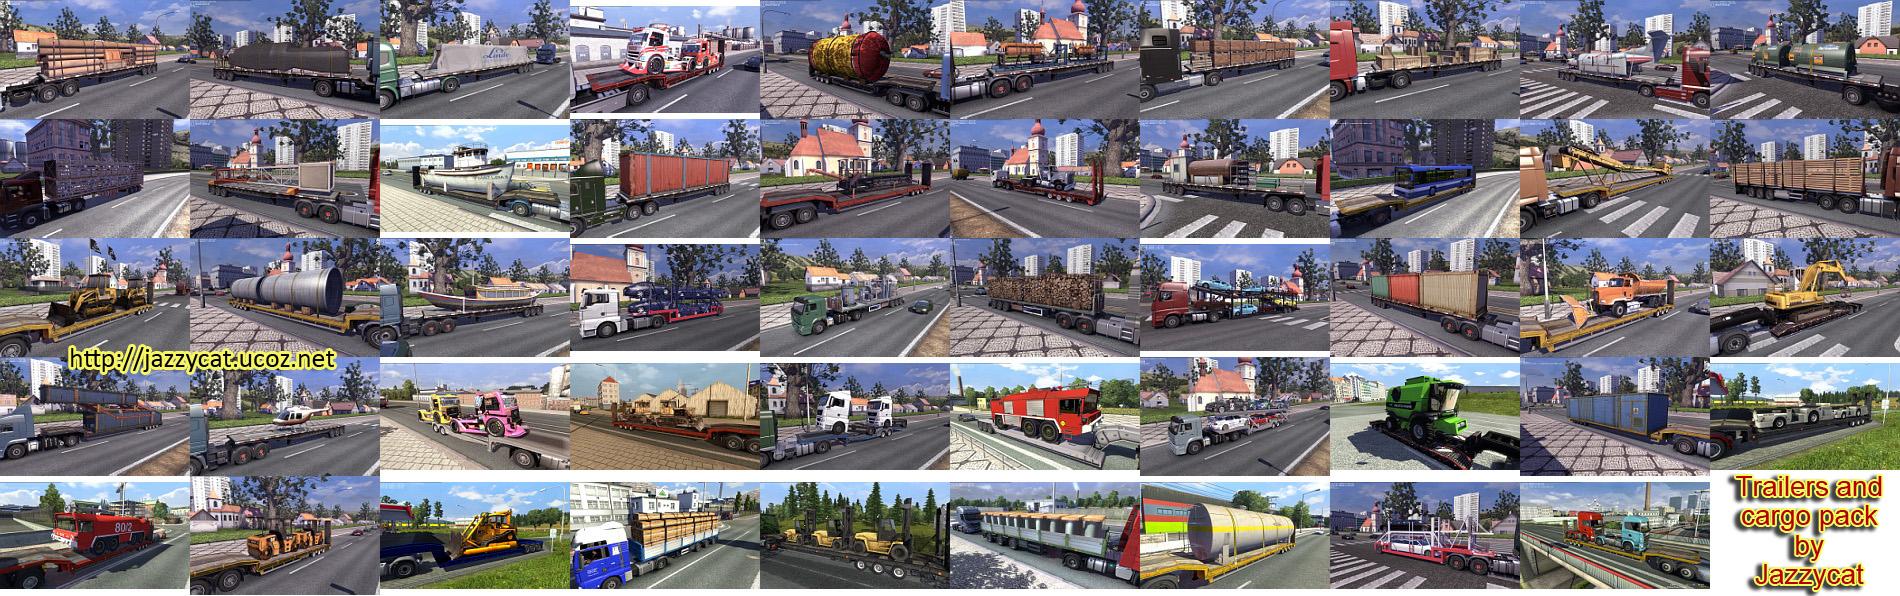 Euro Truck Simulator 2 Пак прицепов и грузов v2.1.1 Trailers and Carg